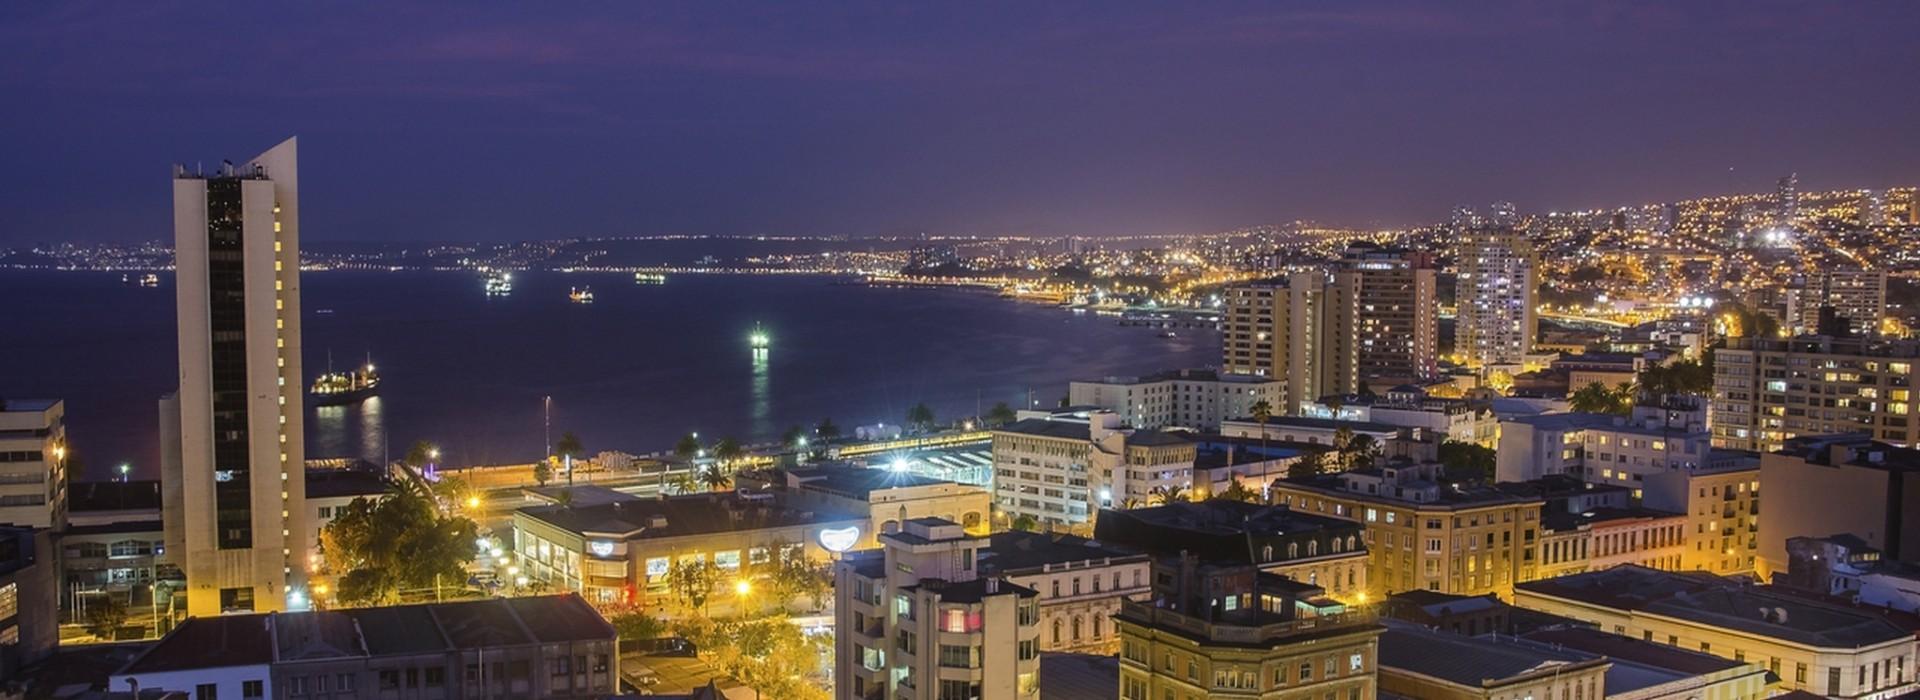 Valparaiso Tours and Holidays 2019/2020